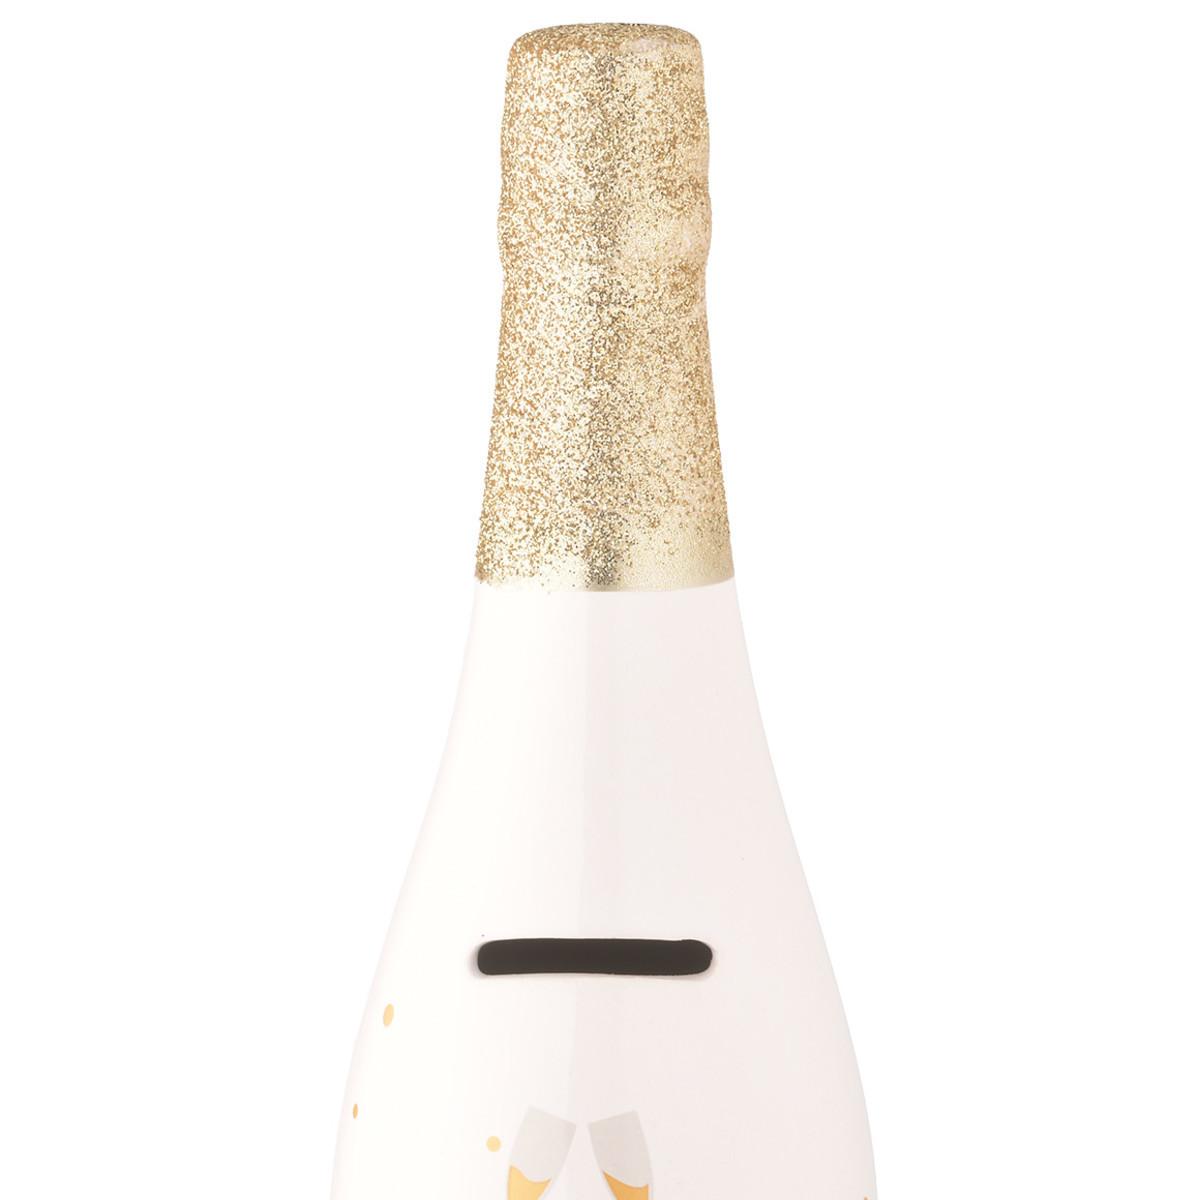 Bild 2 von Spardose Prosecco-Flasche aus Keramik